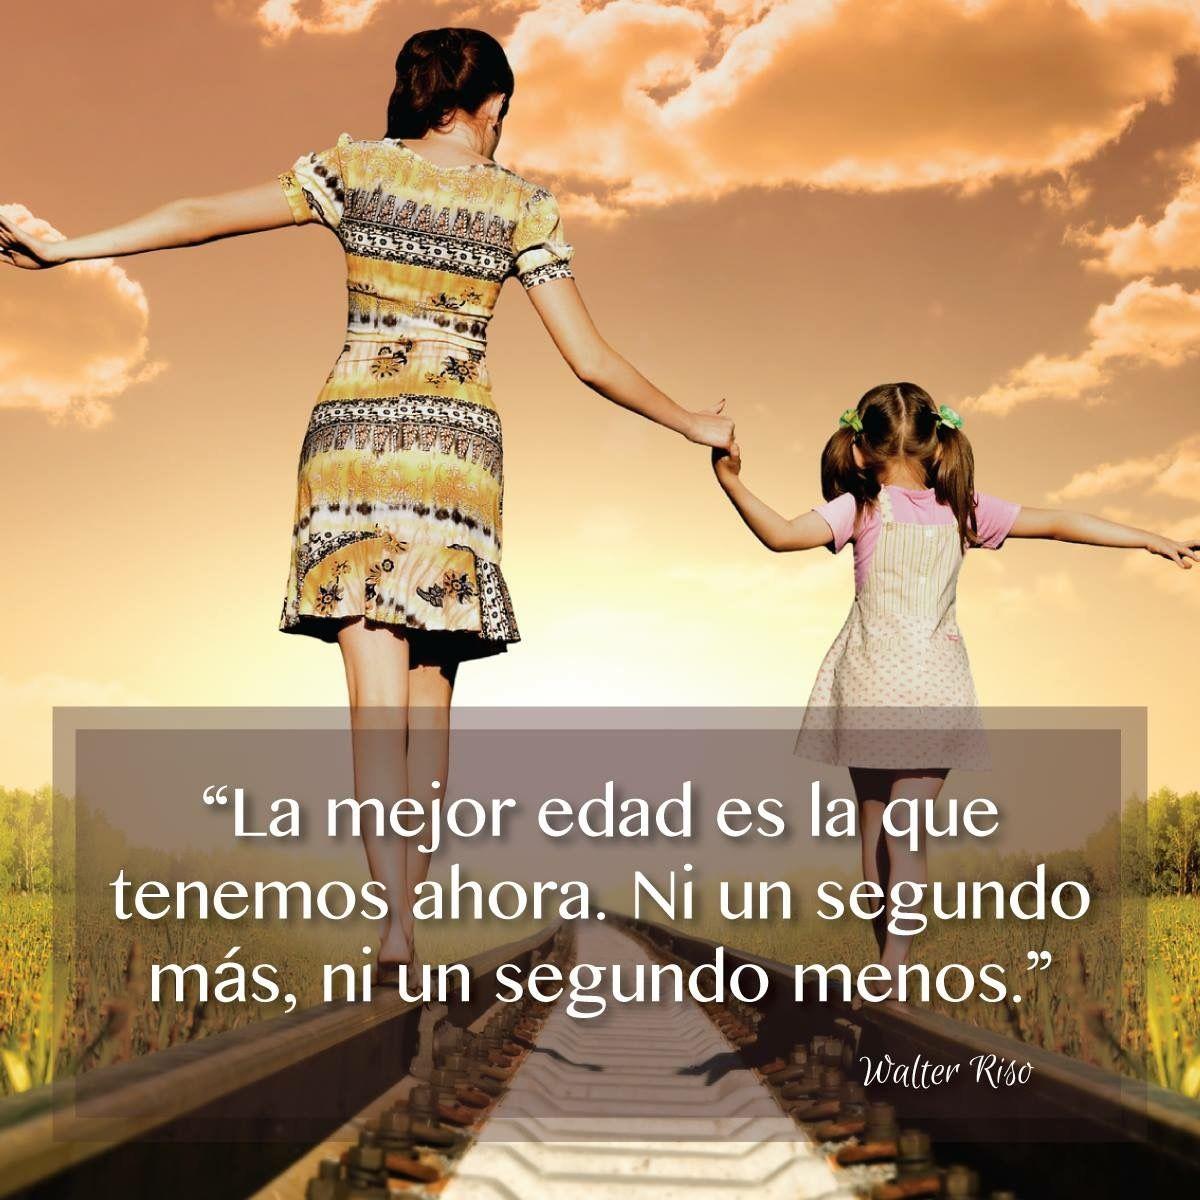 Walter O brien Girly El Amor Deep Quotes Pura Vida Positive Quotes Words Humility Women s